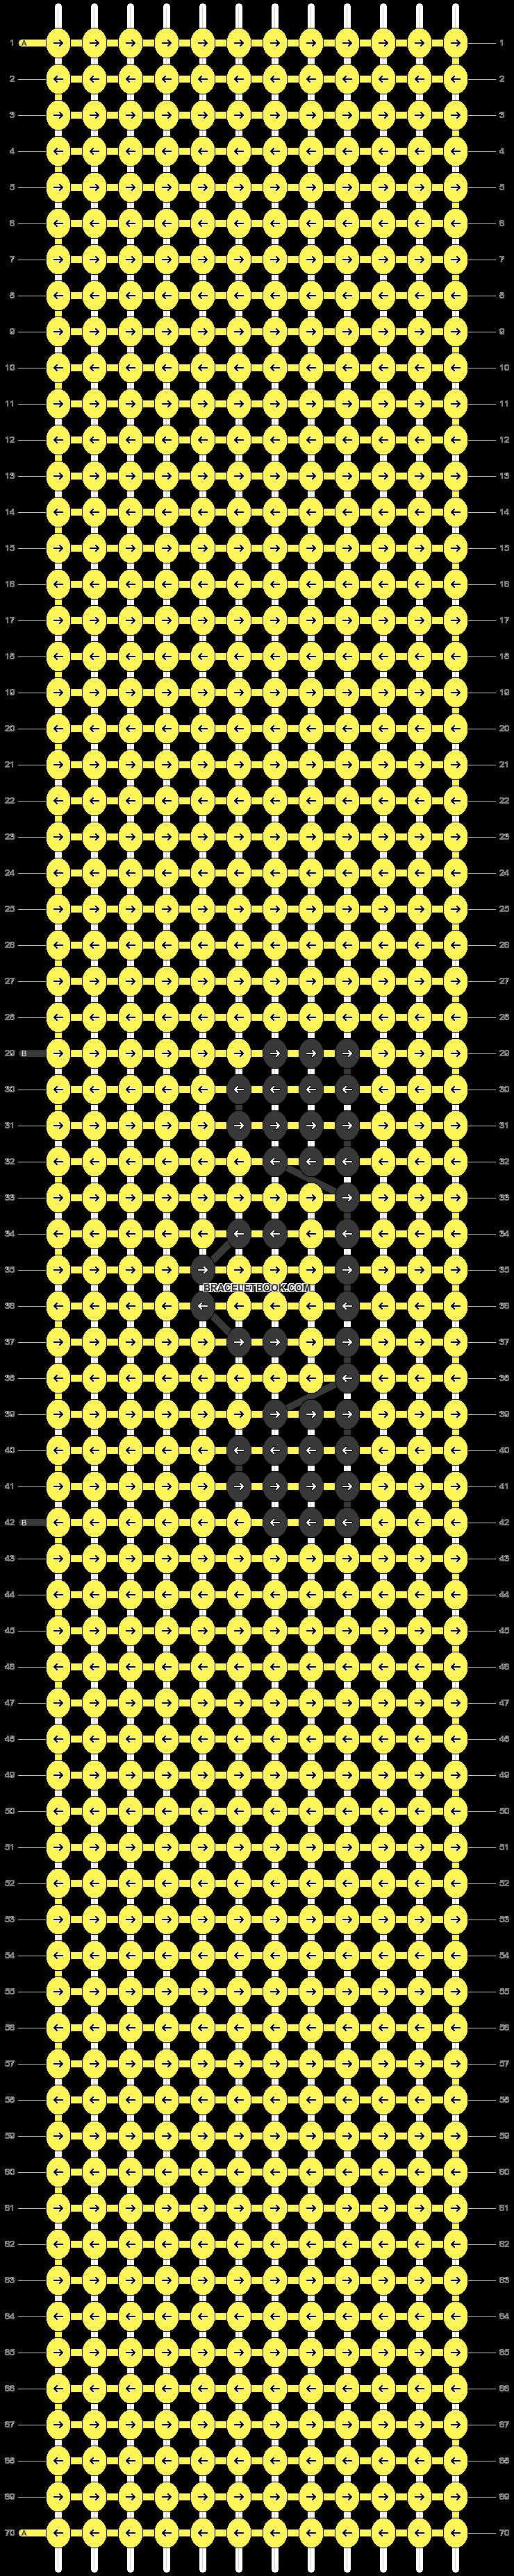 Alpha pattern #46177 pattern